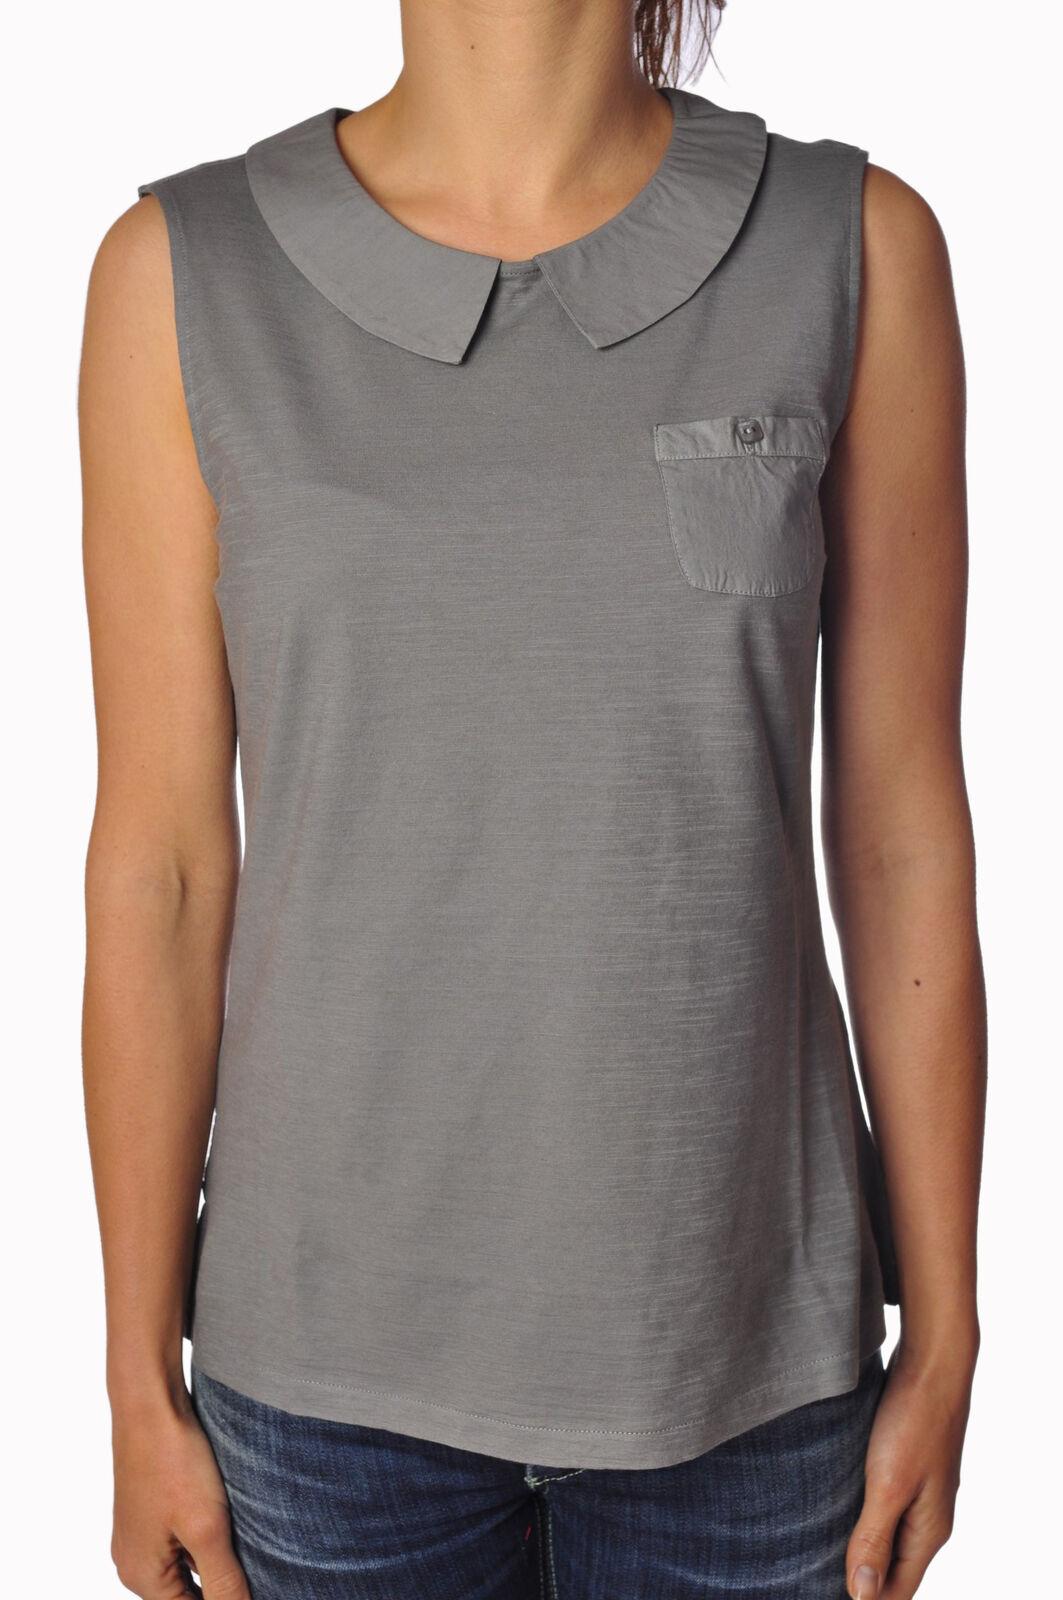 Mercì - Topwear-Sleeveless Top - woman - grau - 787217C184454